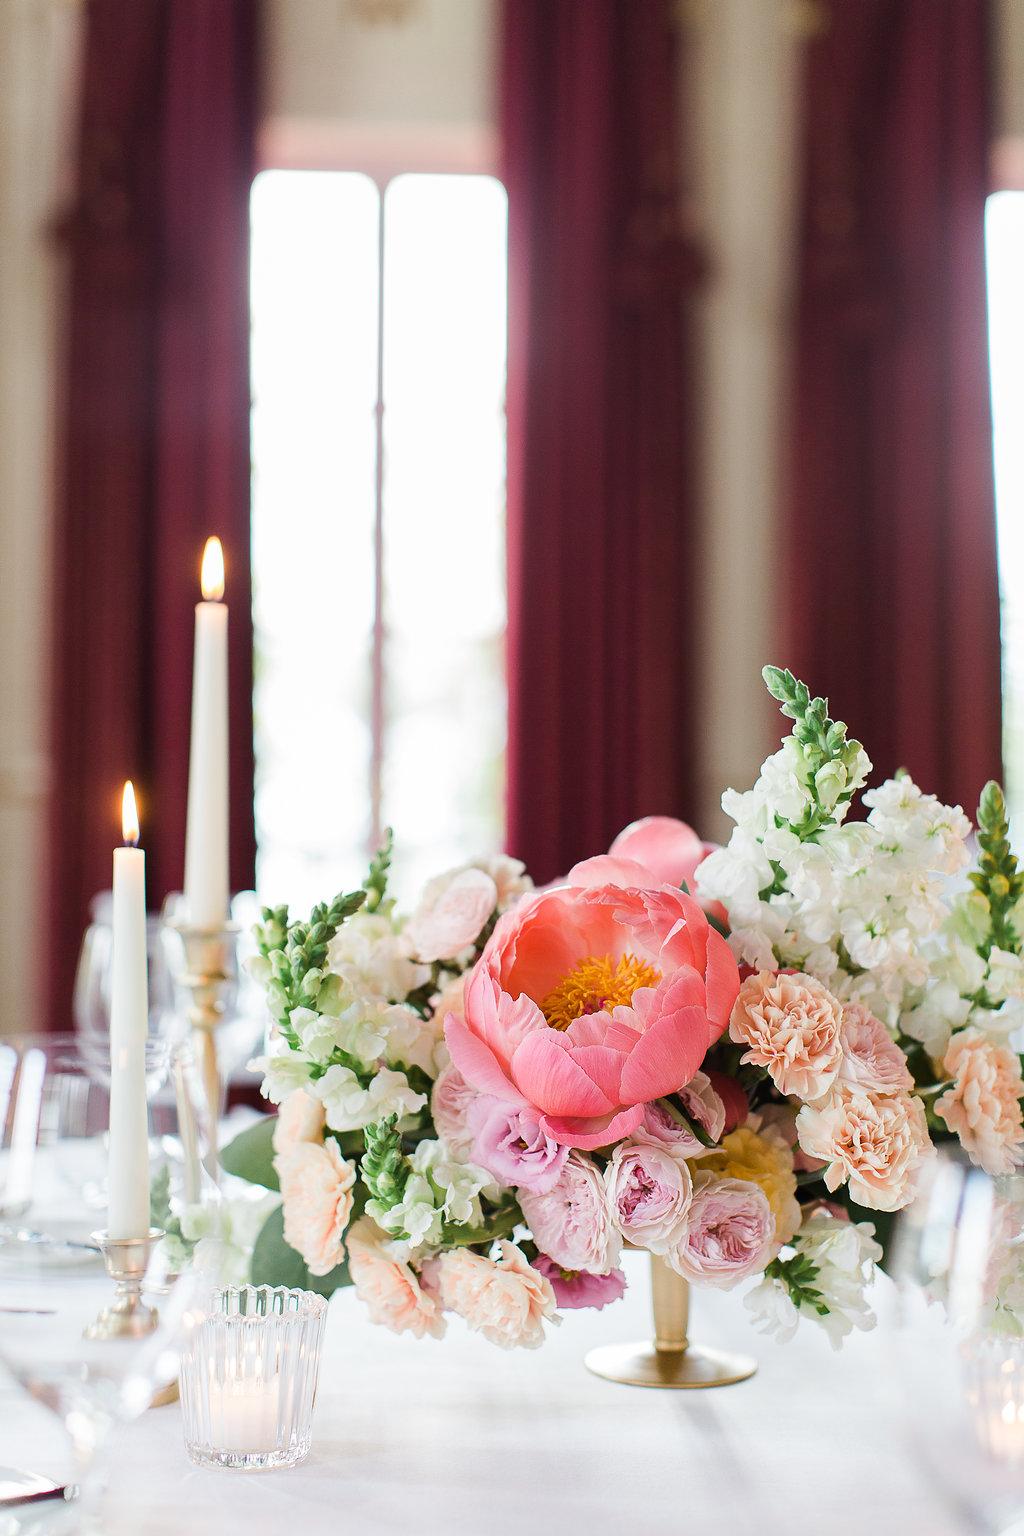 Luxe Navy and Pink Wedding at Schloss Fuschl in Austria by Tanja Kibogo23.JPG